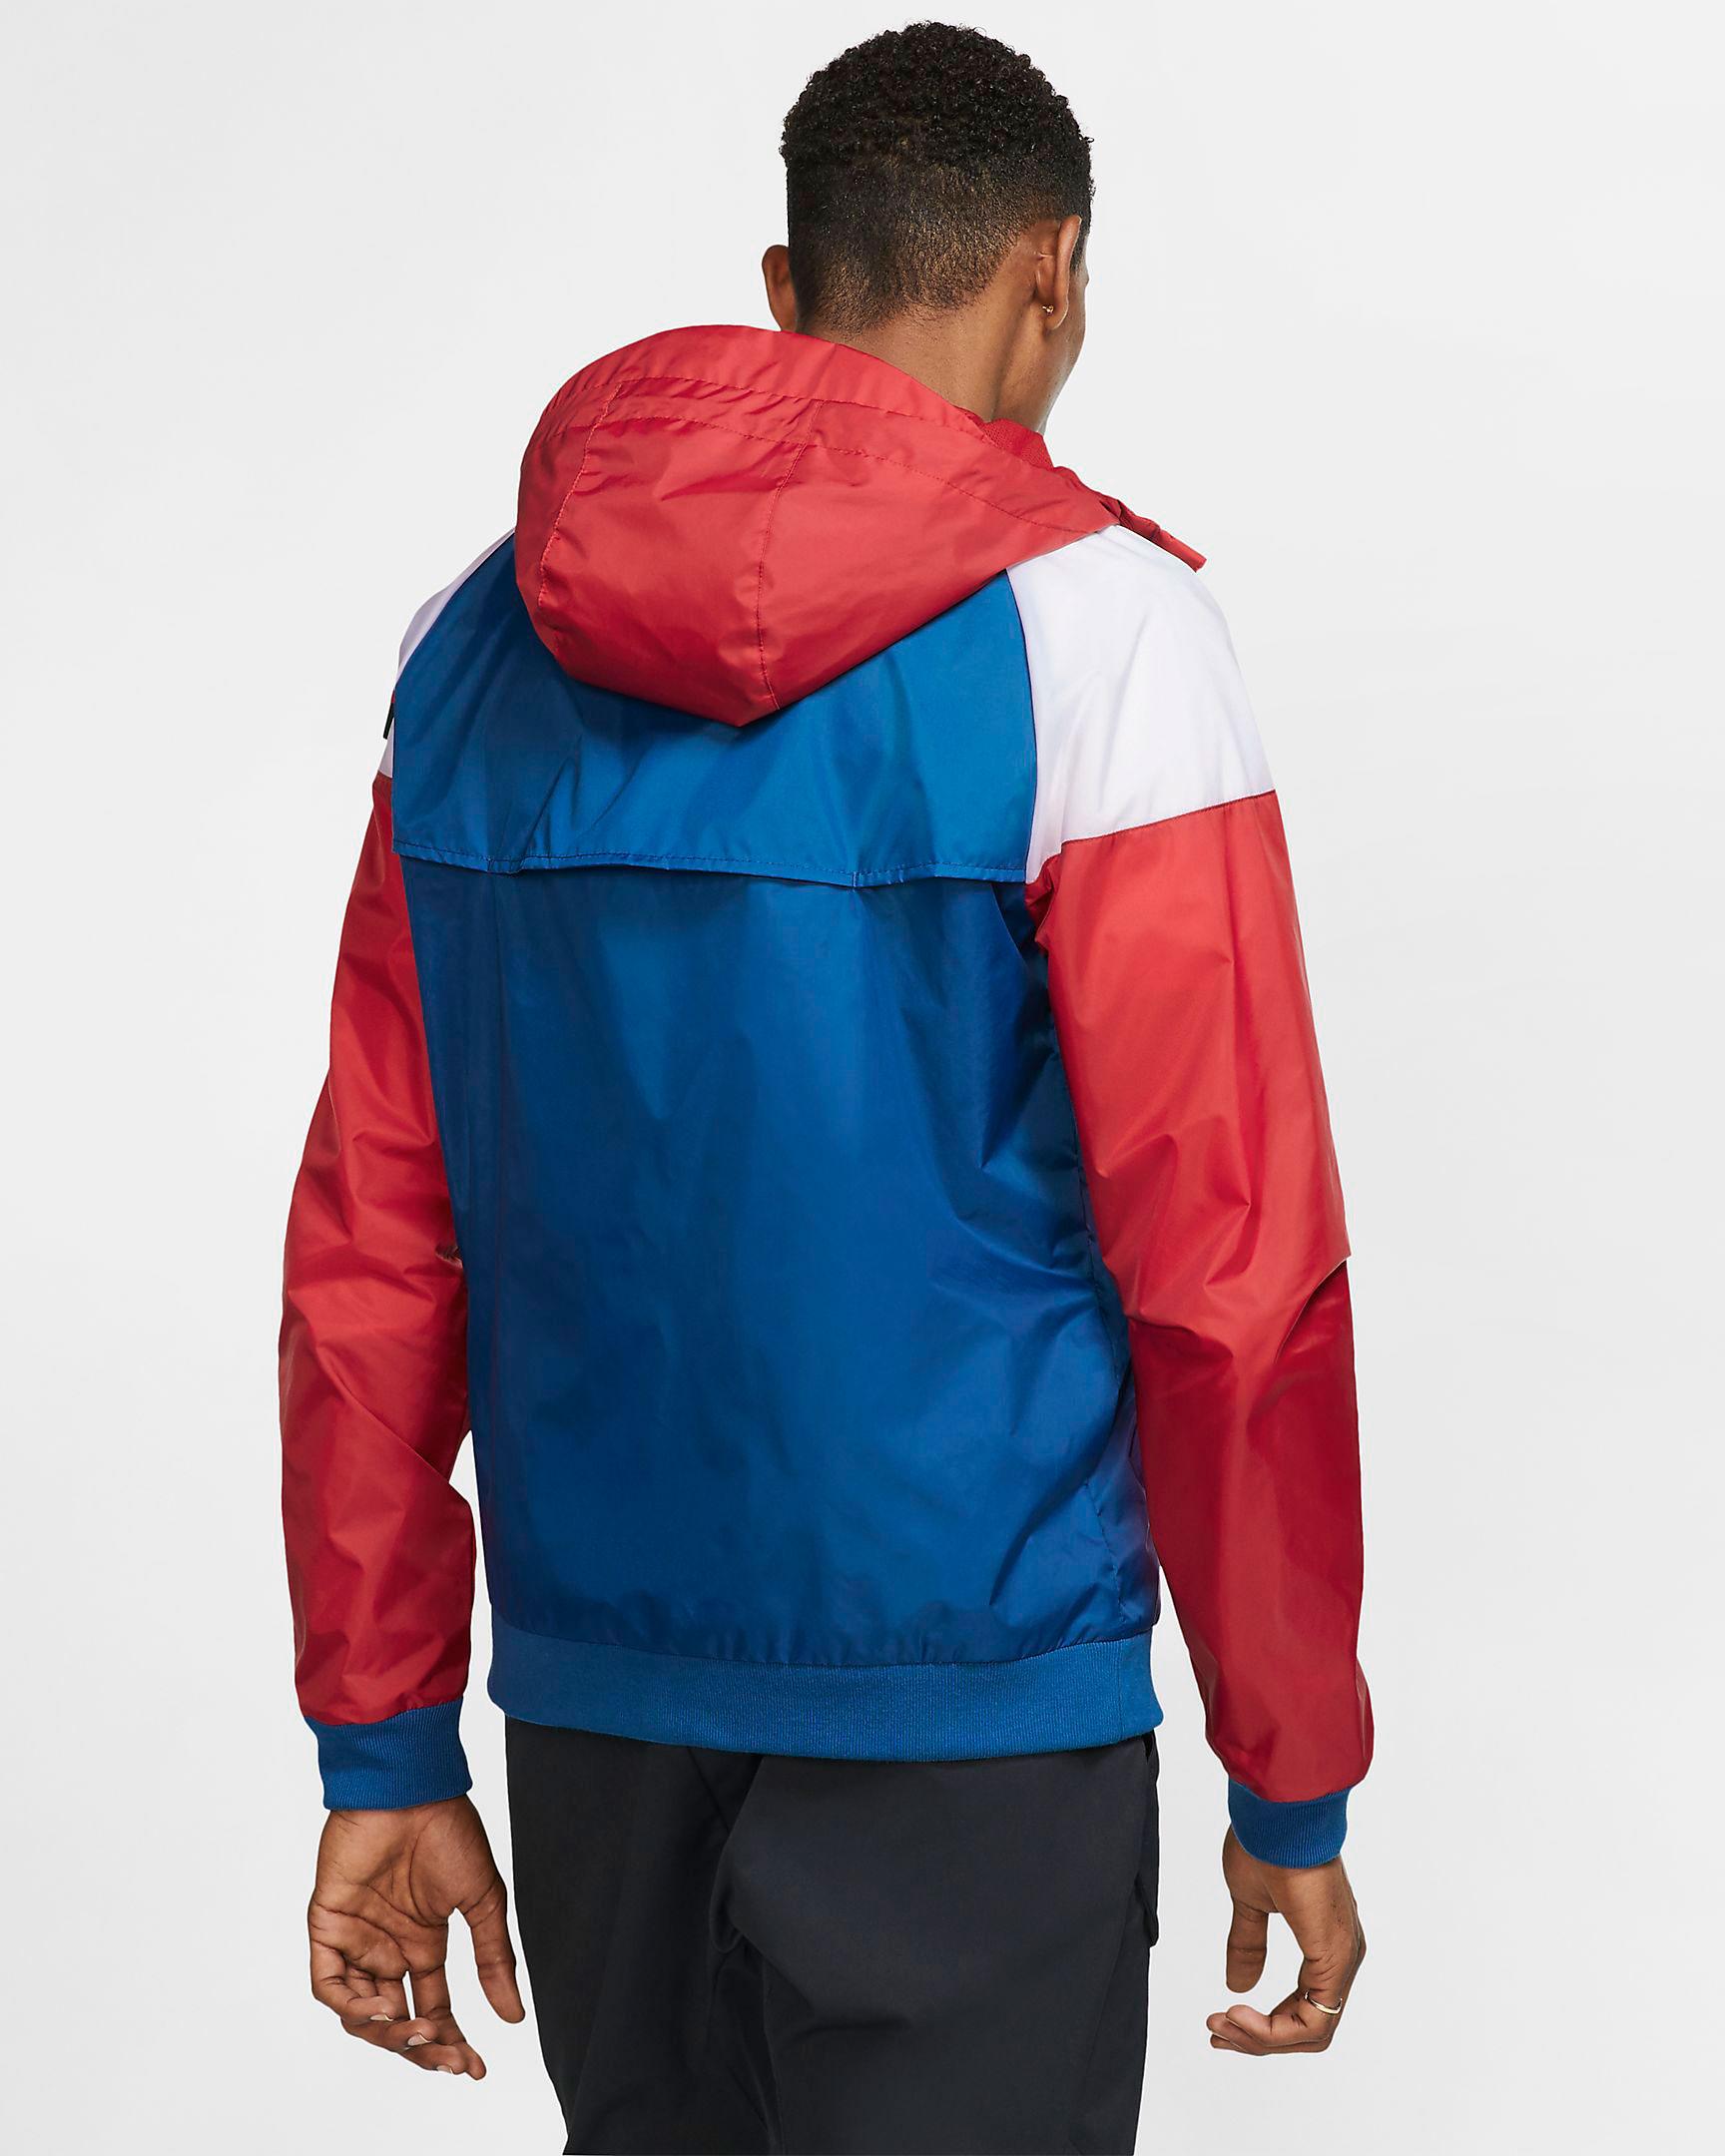 nike-americana-red-white-blue-windrunner-jacket-2